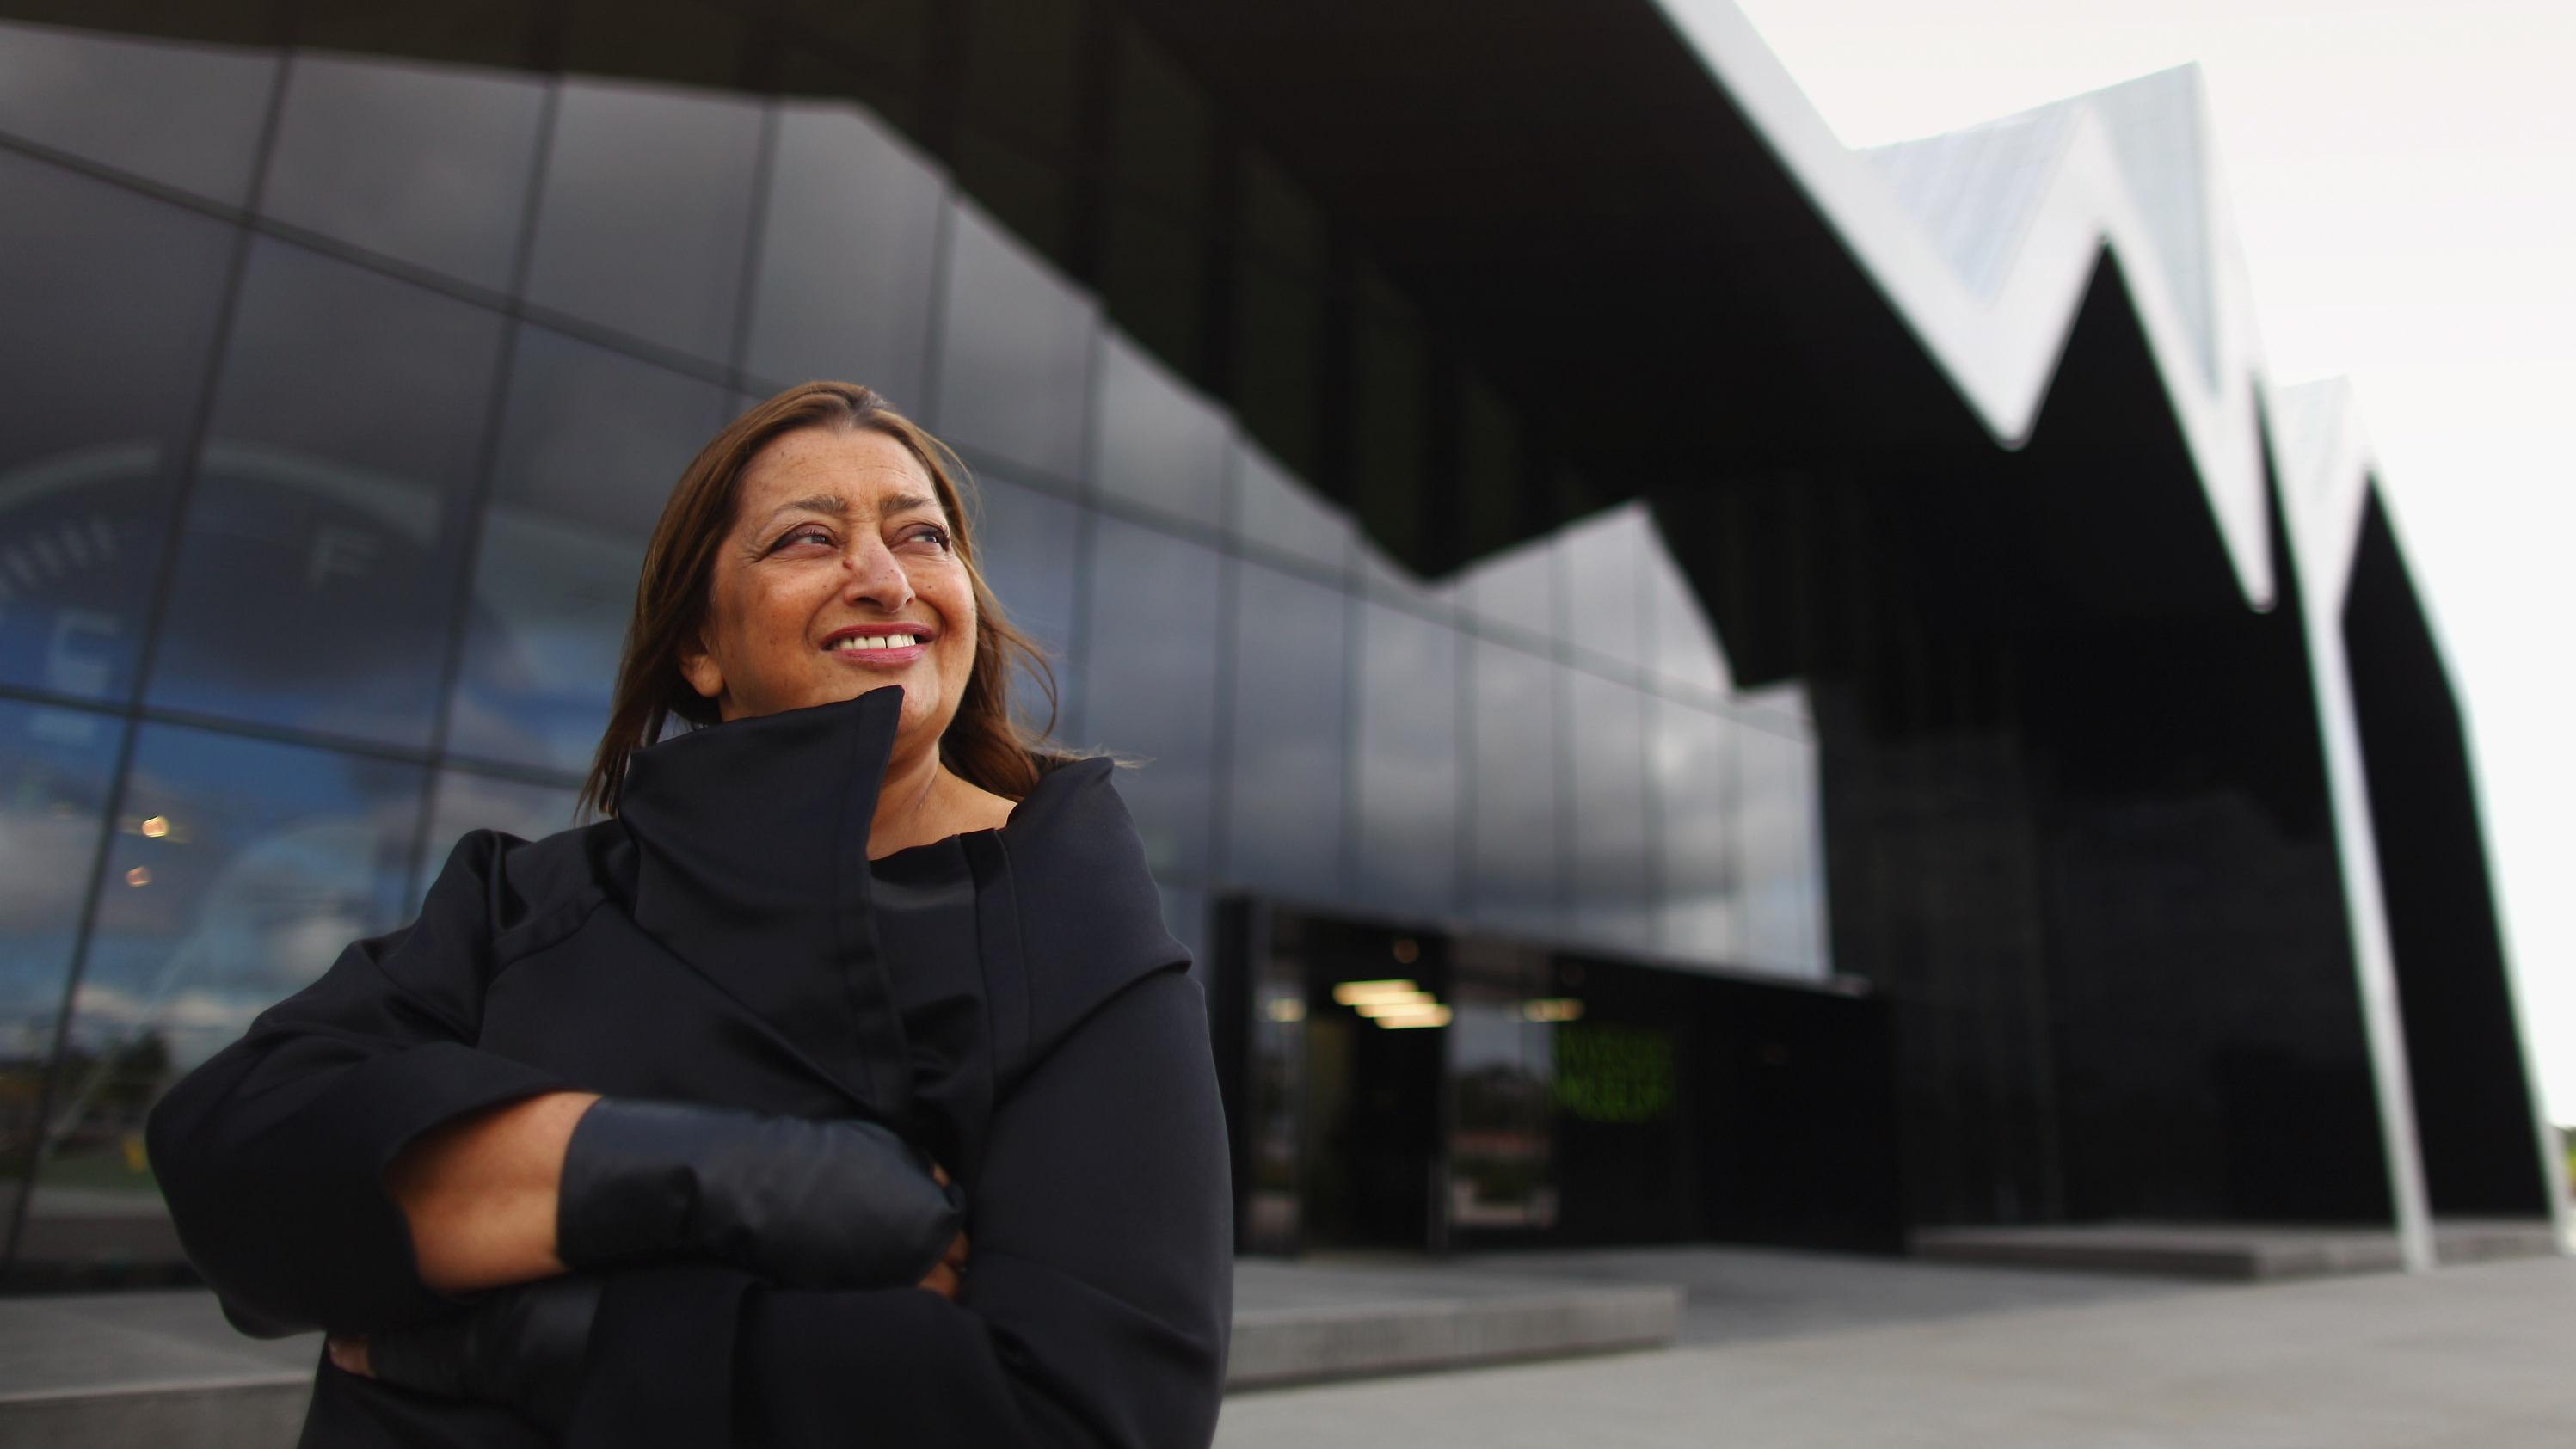 Renowned Architect Zaha Hadid Dies At 65